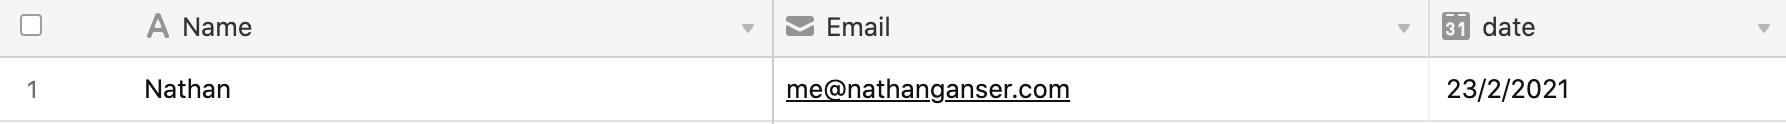 zapier gmail data.png